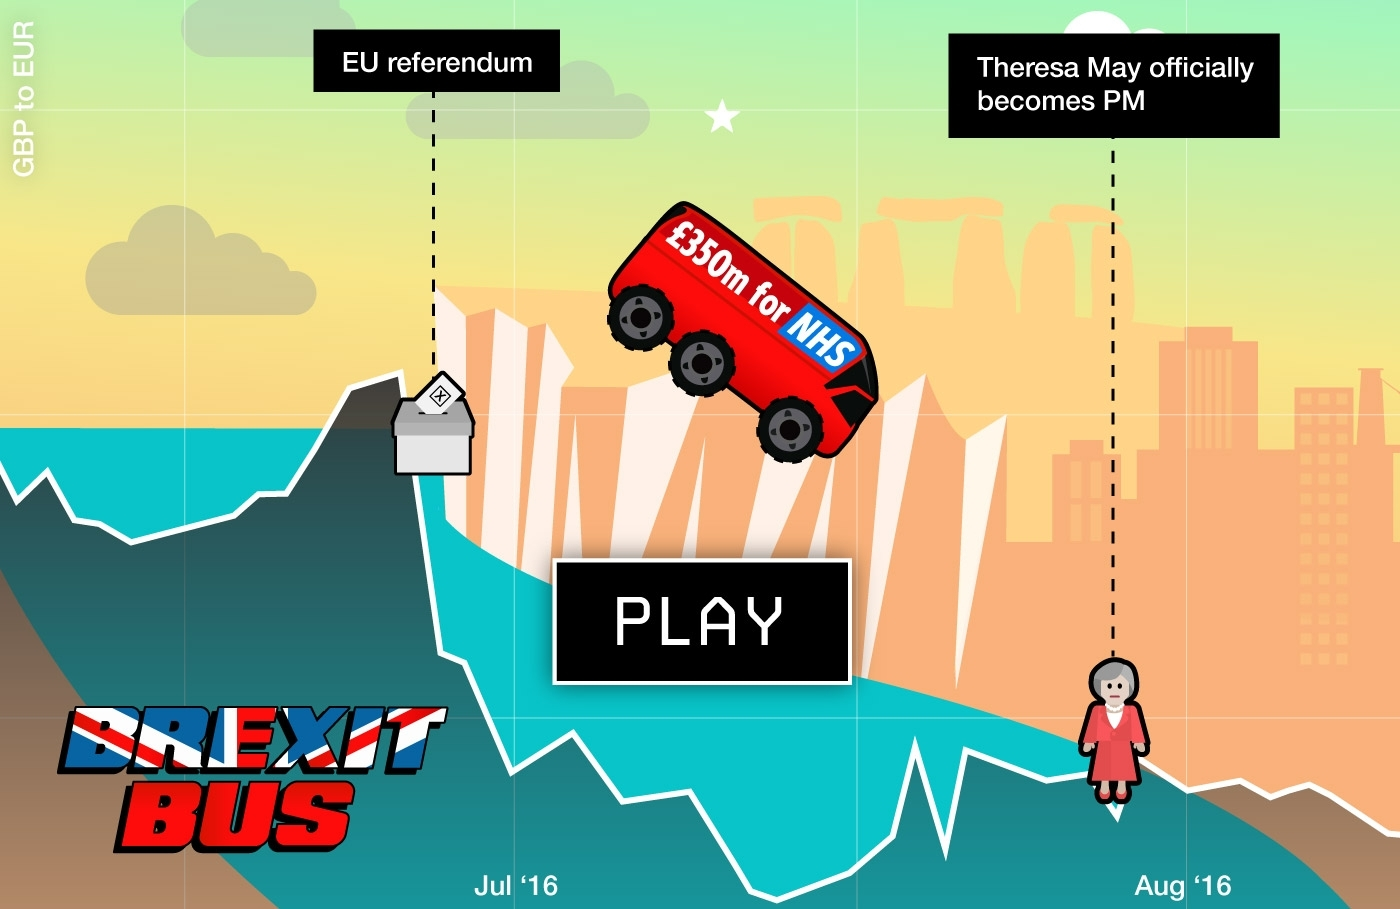 Brexit bus game